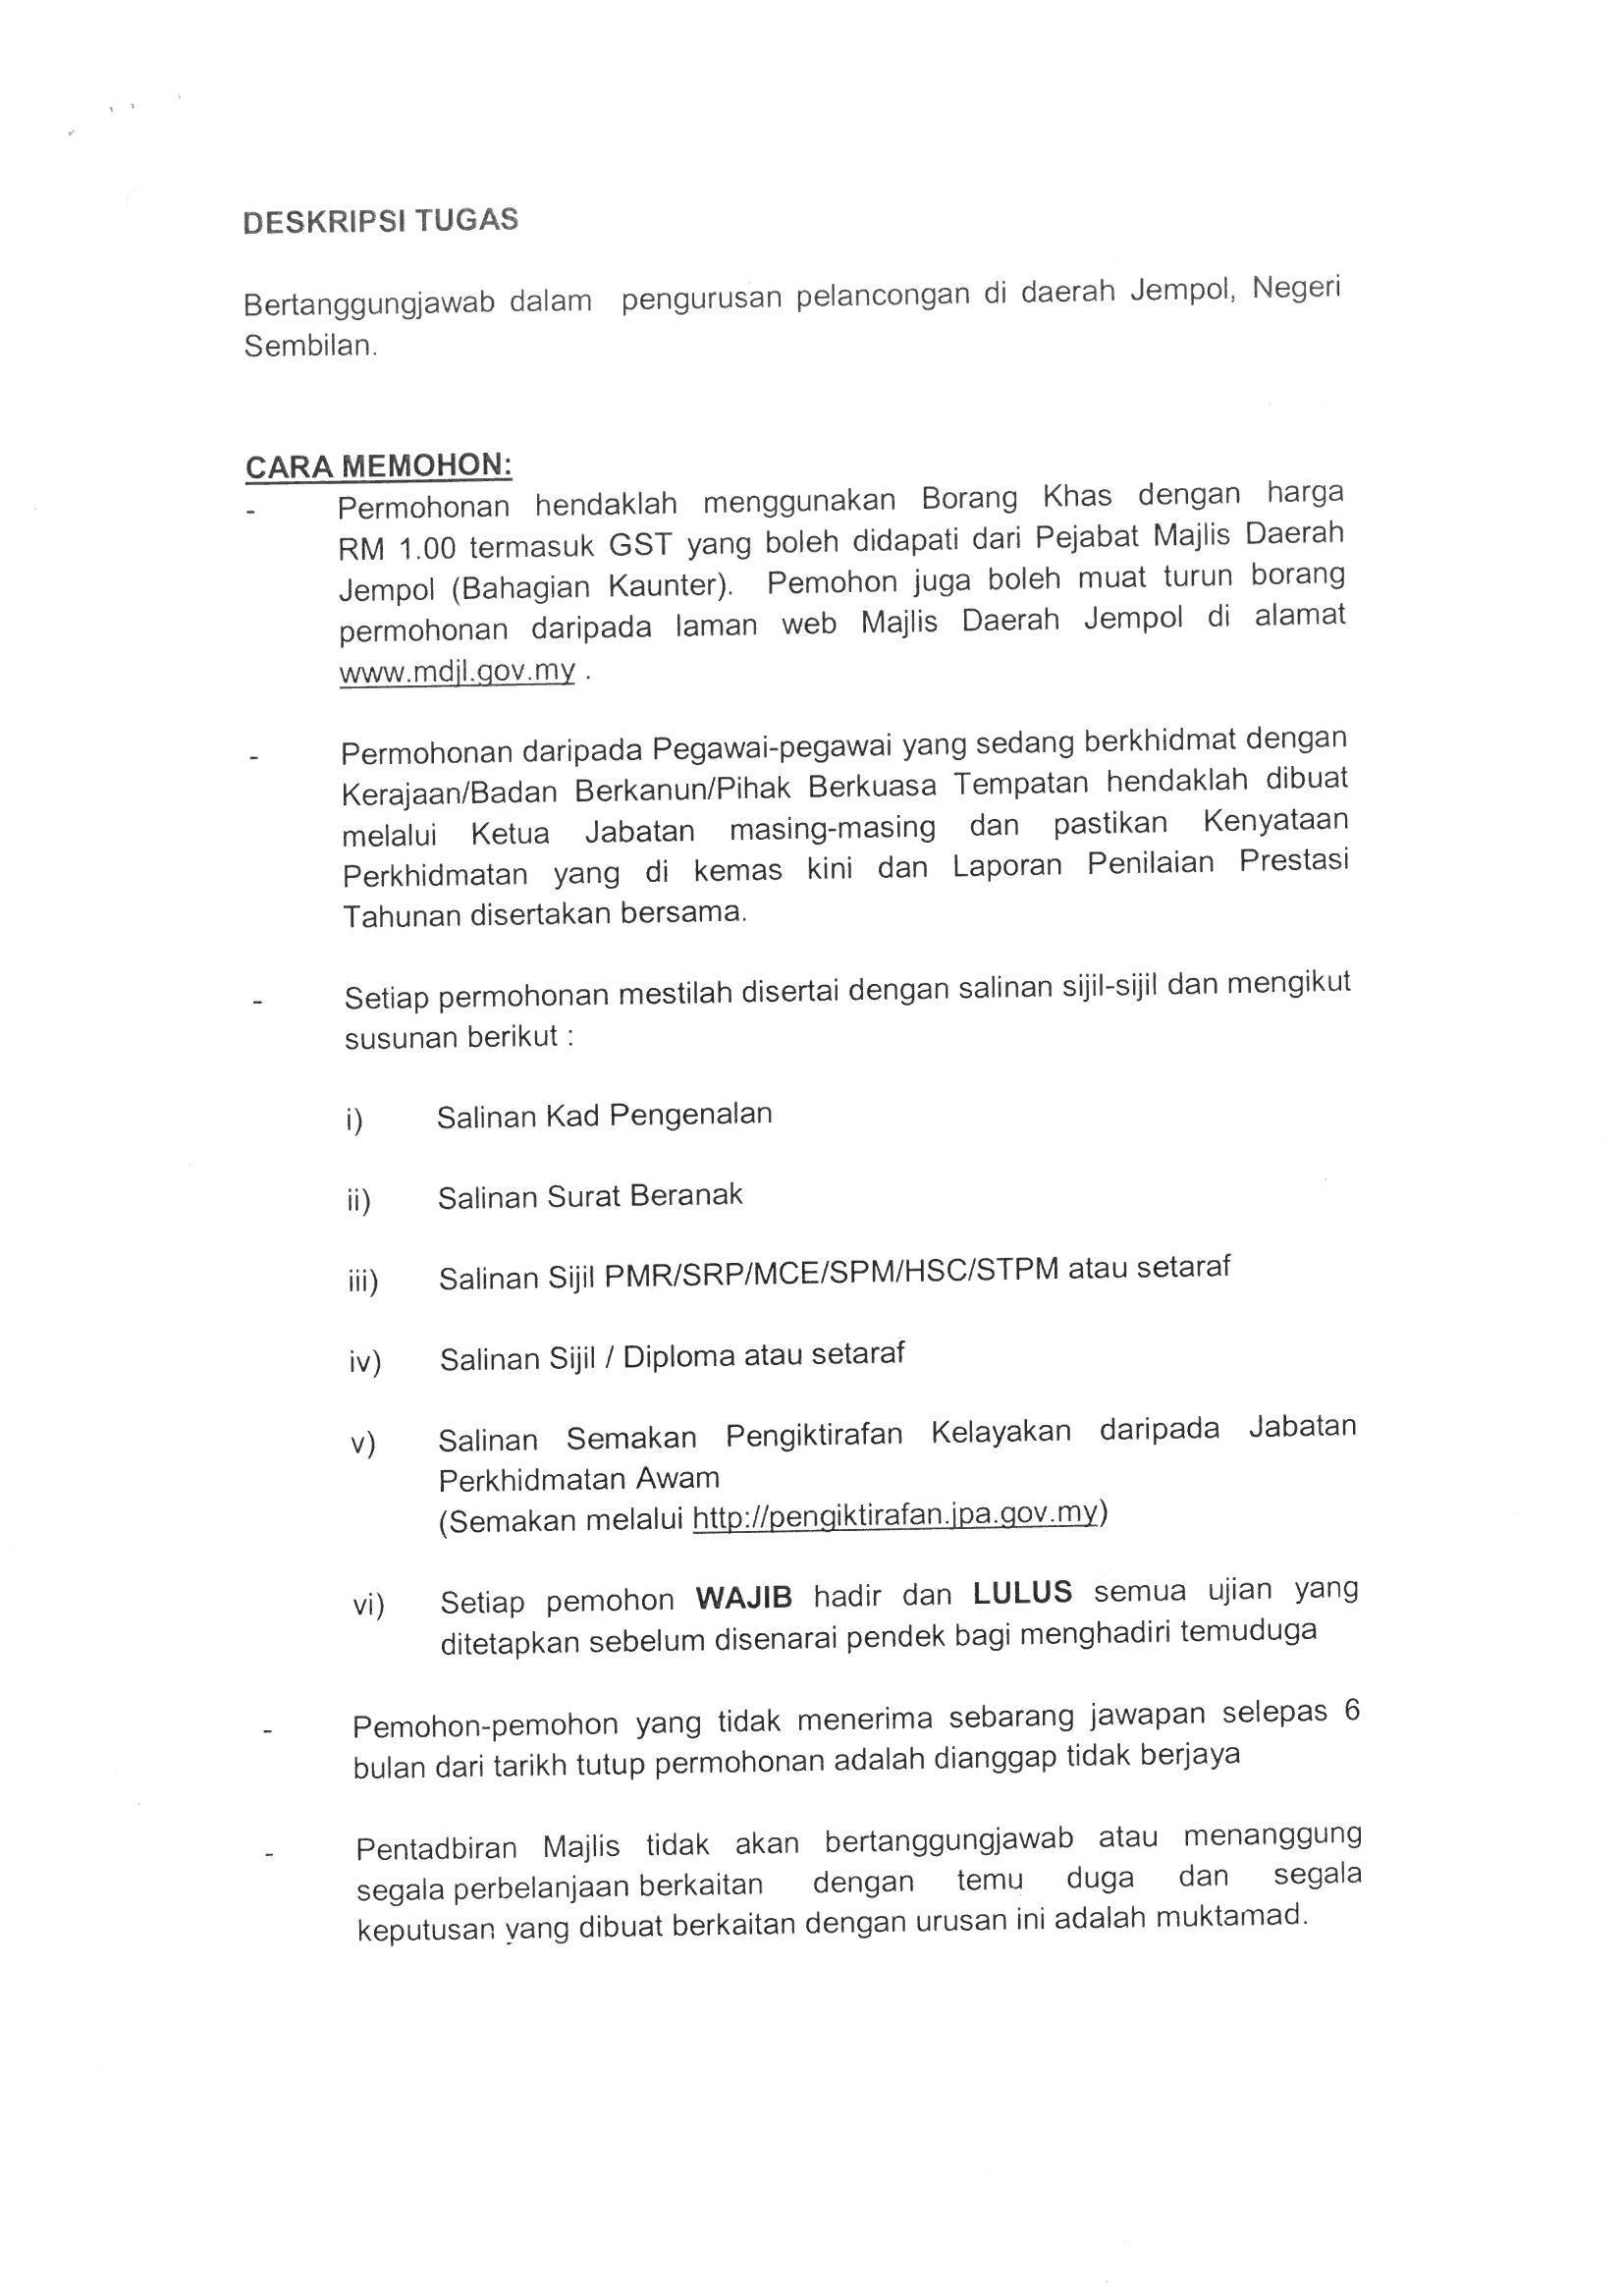 Jawatan Kosong Penolong Pegawai Tadbir N29 Pelancongan Official Portal Of Jempol District Council Mdj